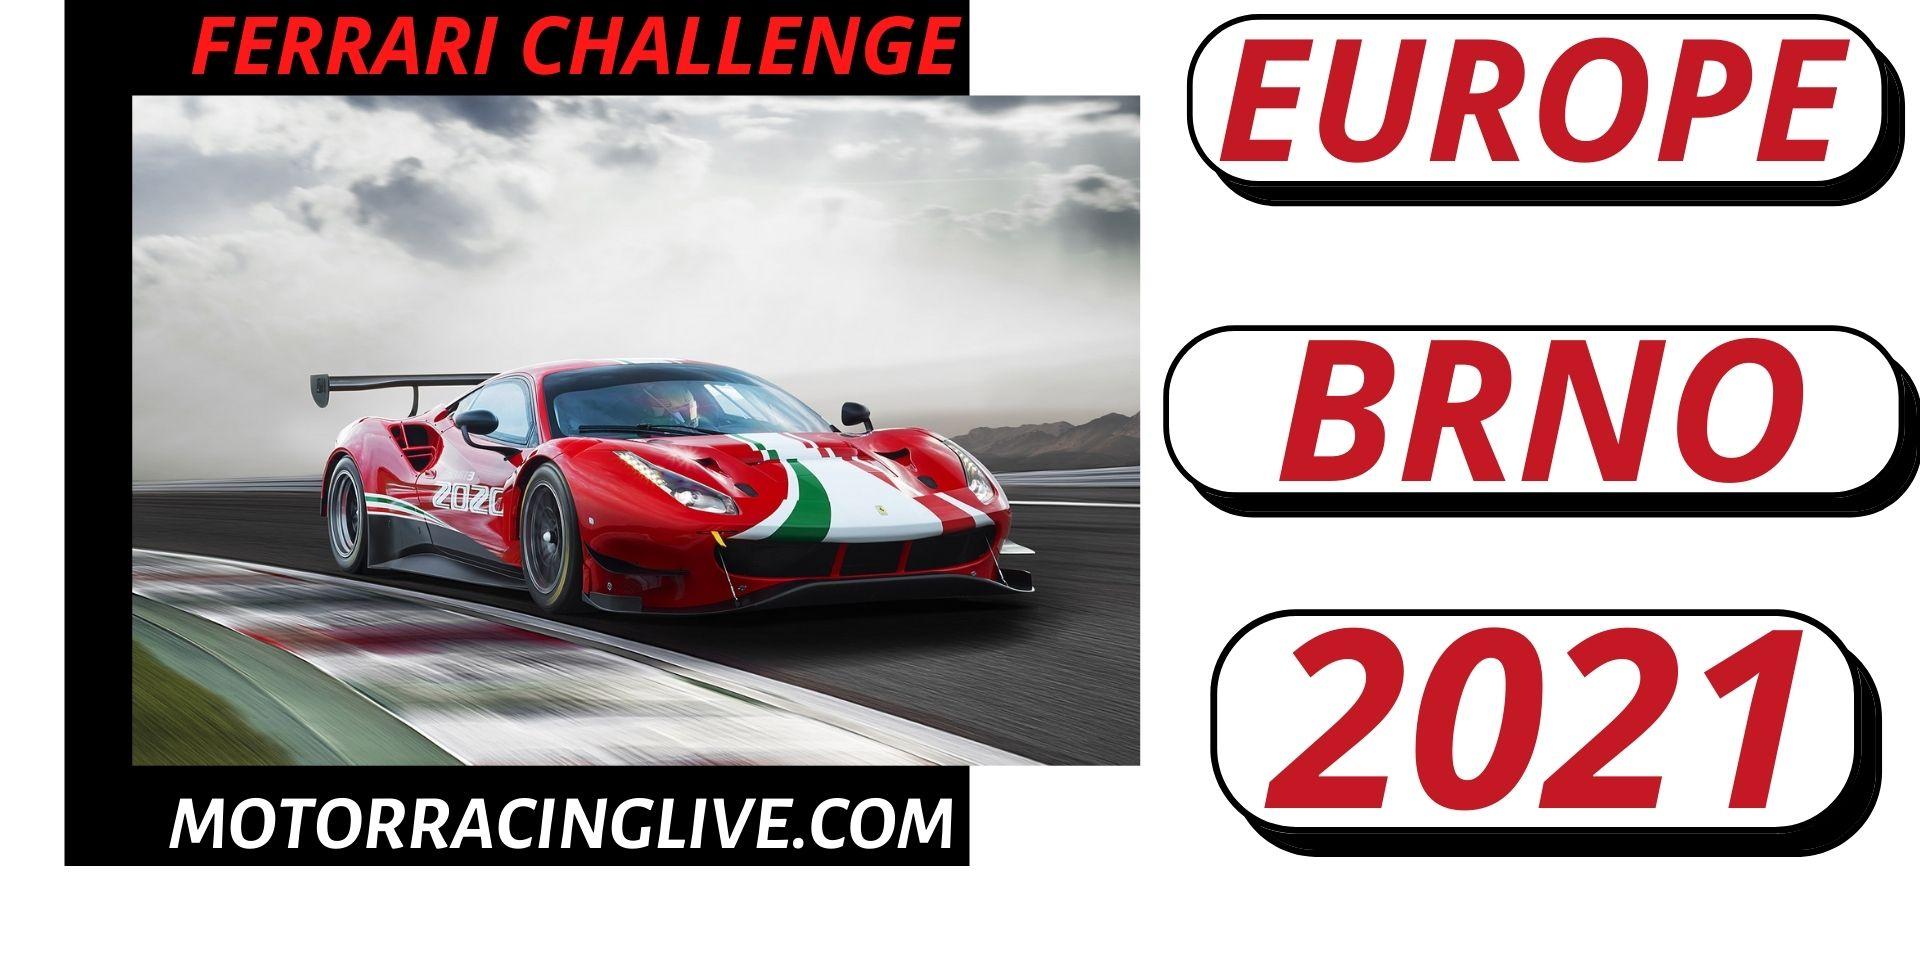 Brno Ferrari Challenge Europe Live Stream 2021